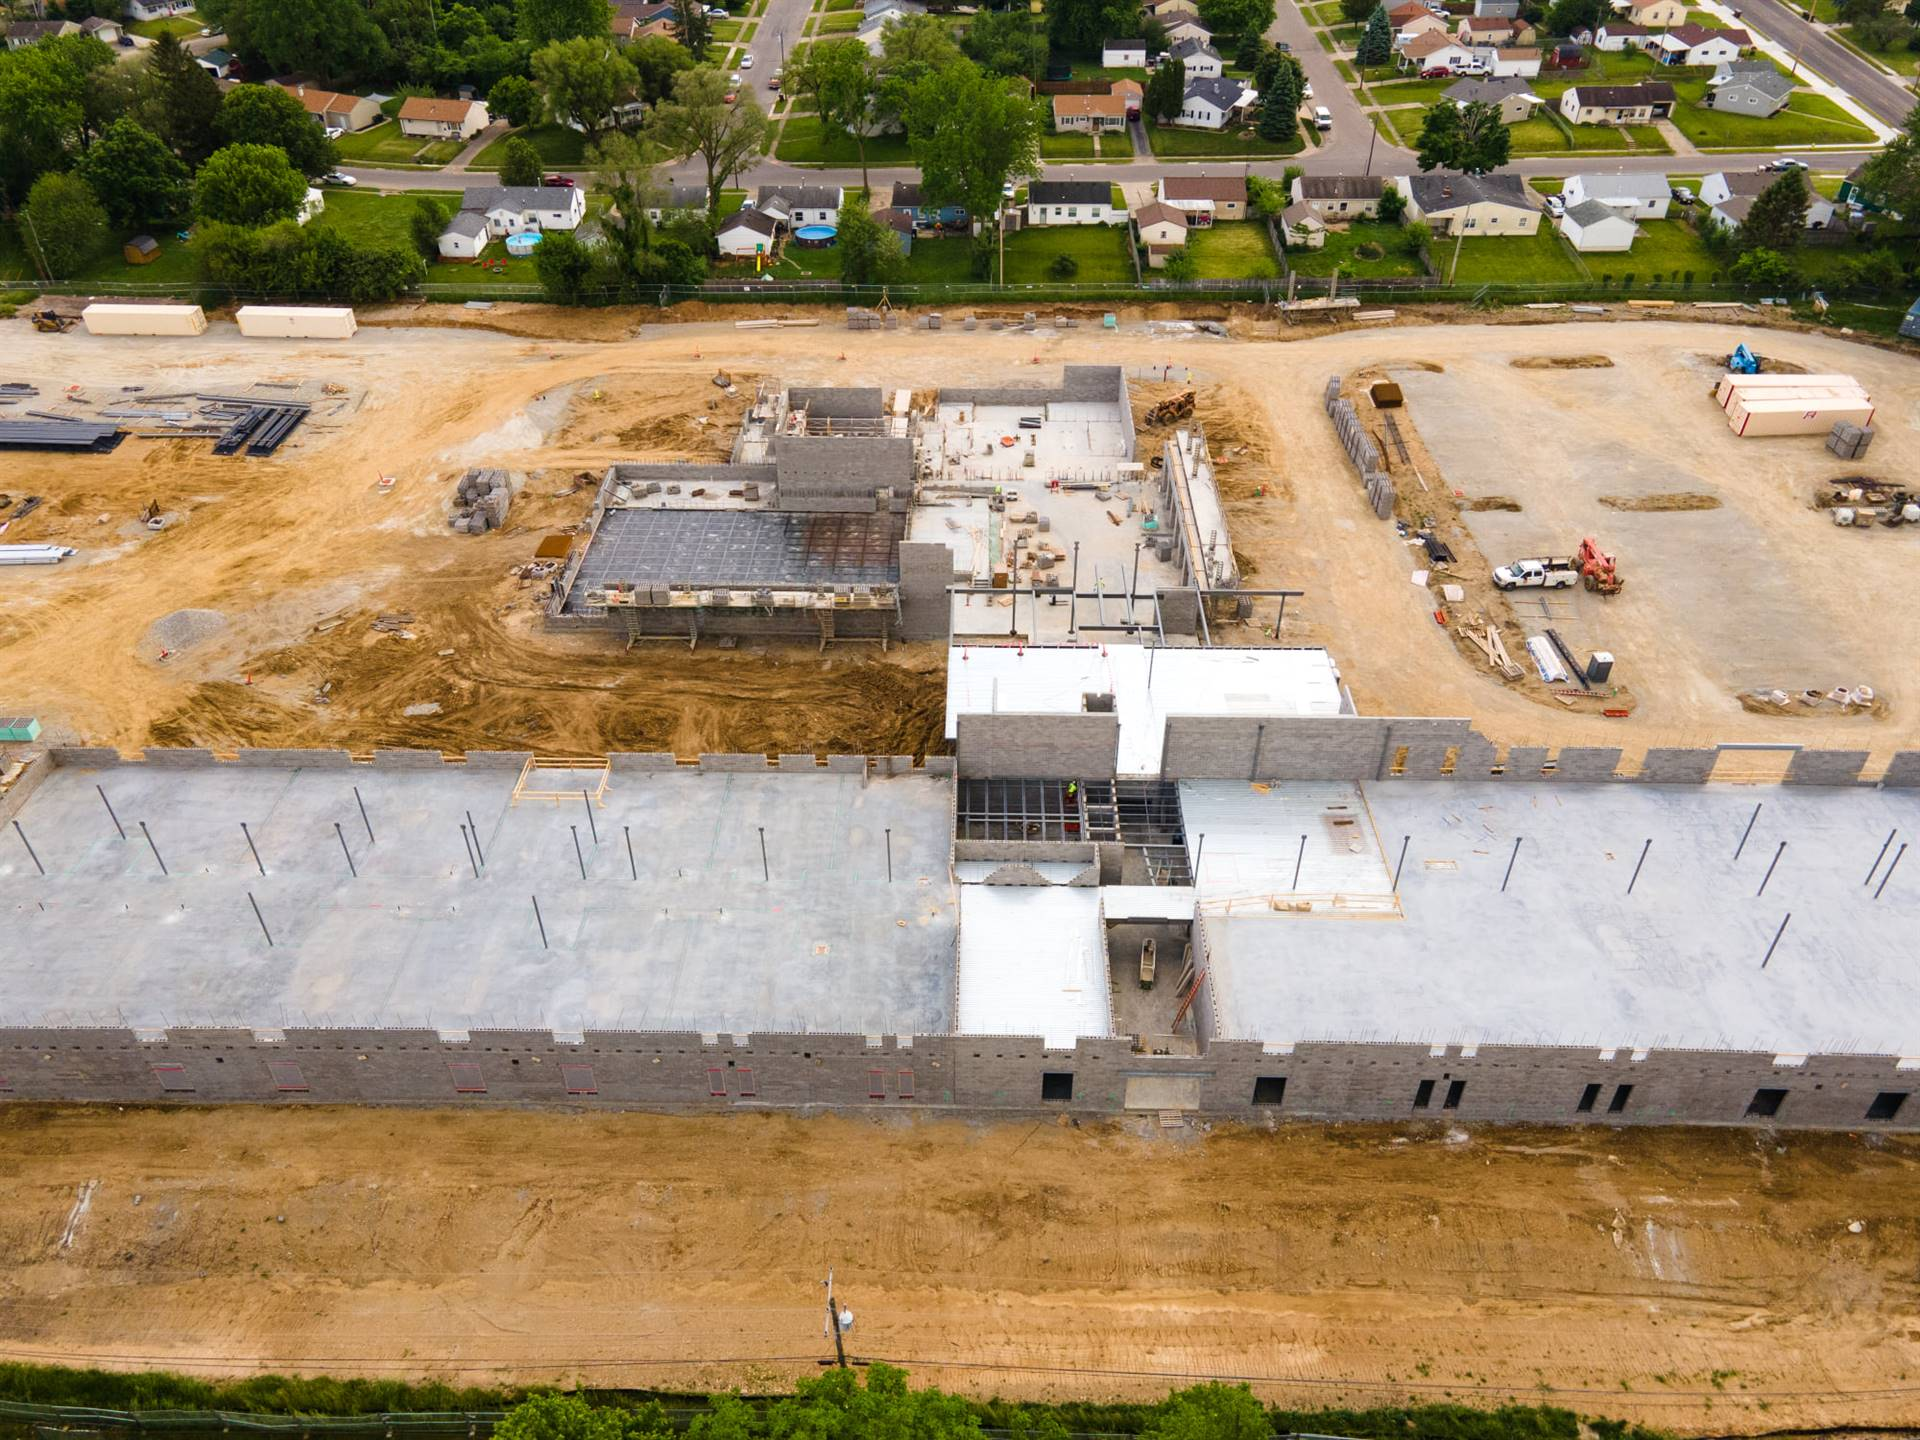 Mark Rickert/Busy Bee Aerials LLC-photos from May 24, 2021